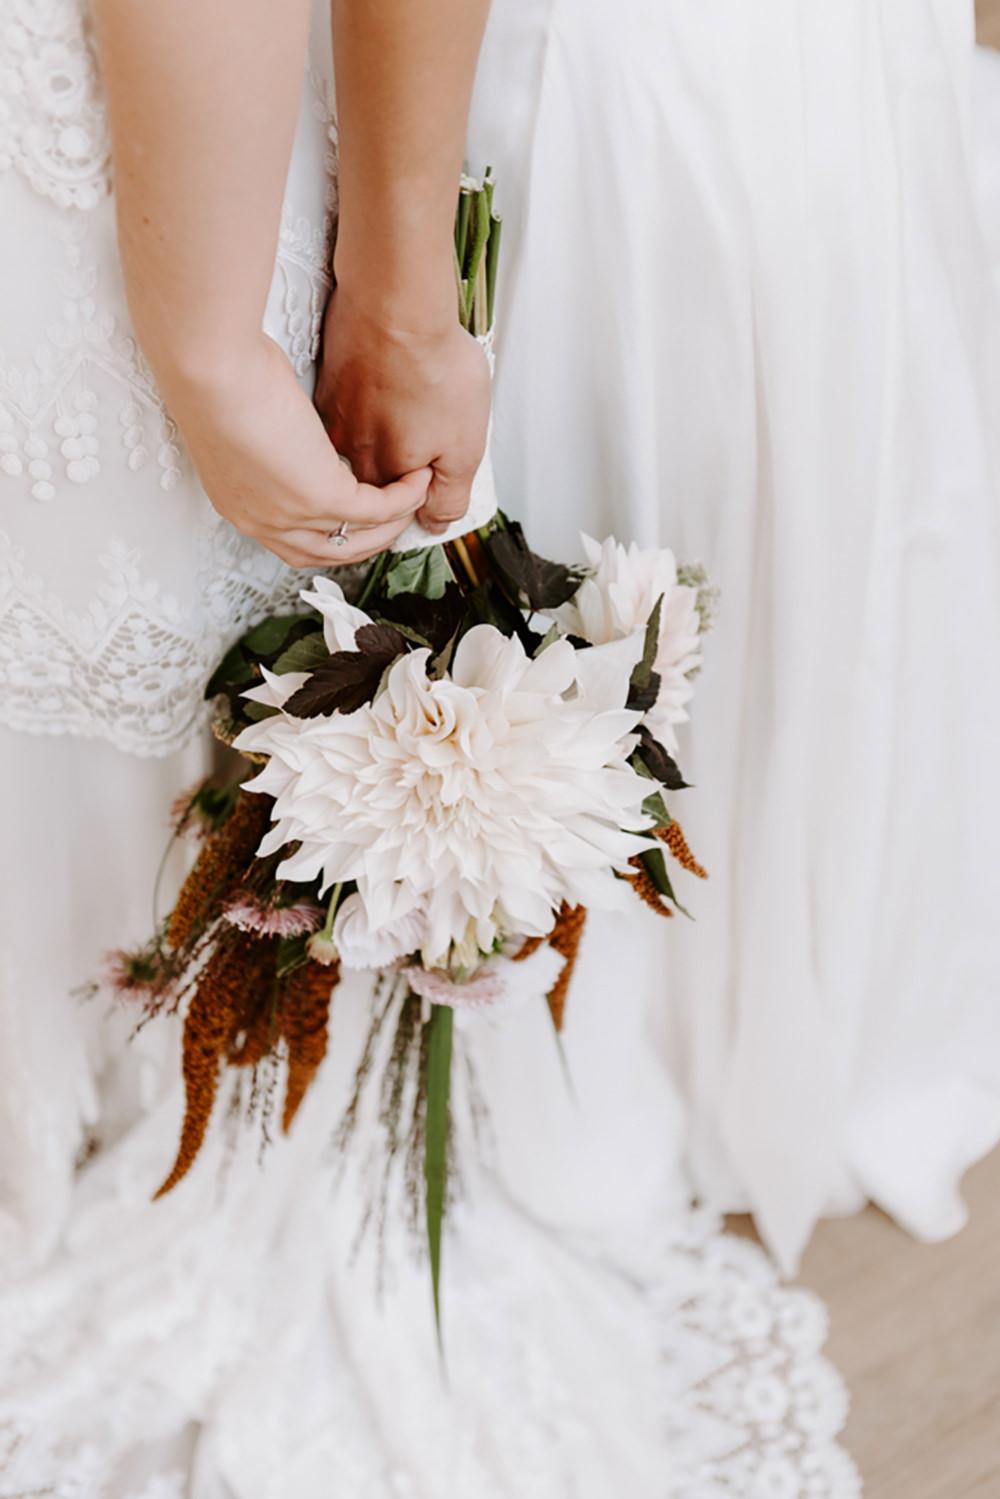 Bride Bridal Bouquet Flowers Cafe Au Lait Dahlia Ethical Wedding Ideas Sadie Osborne Photography